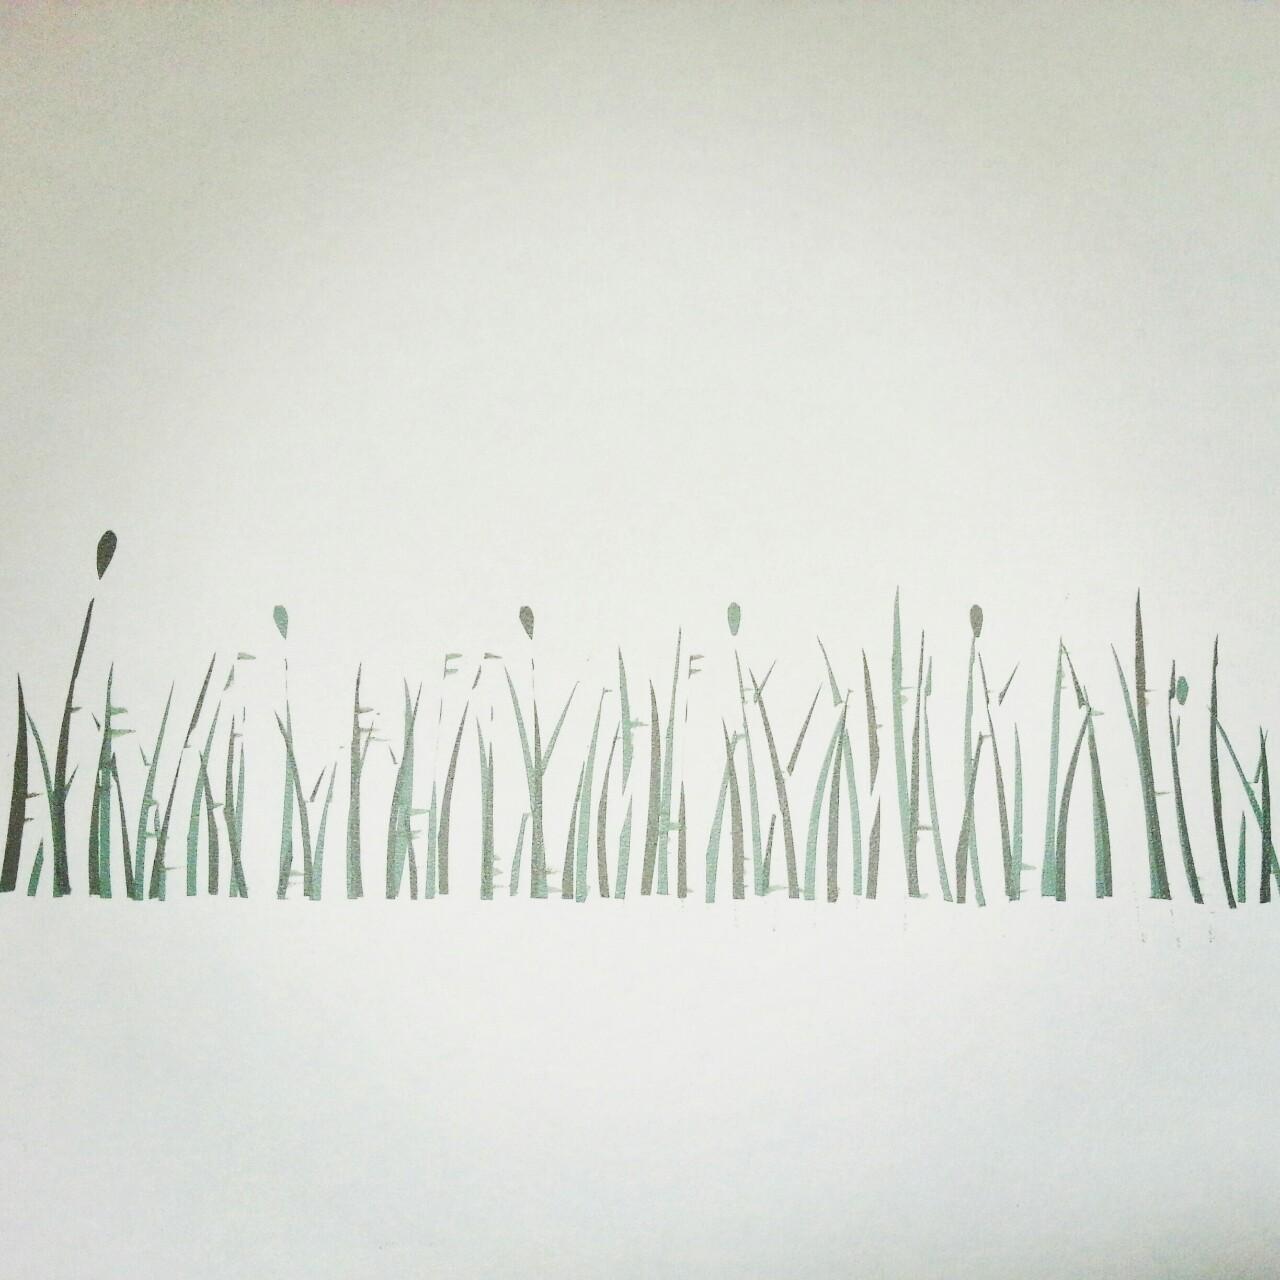 Printing grasses.